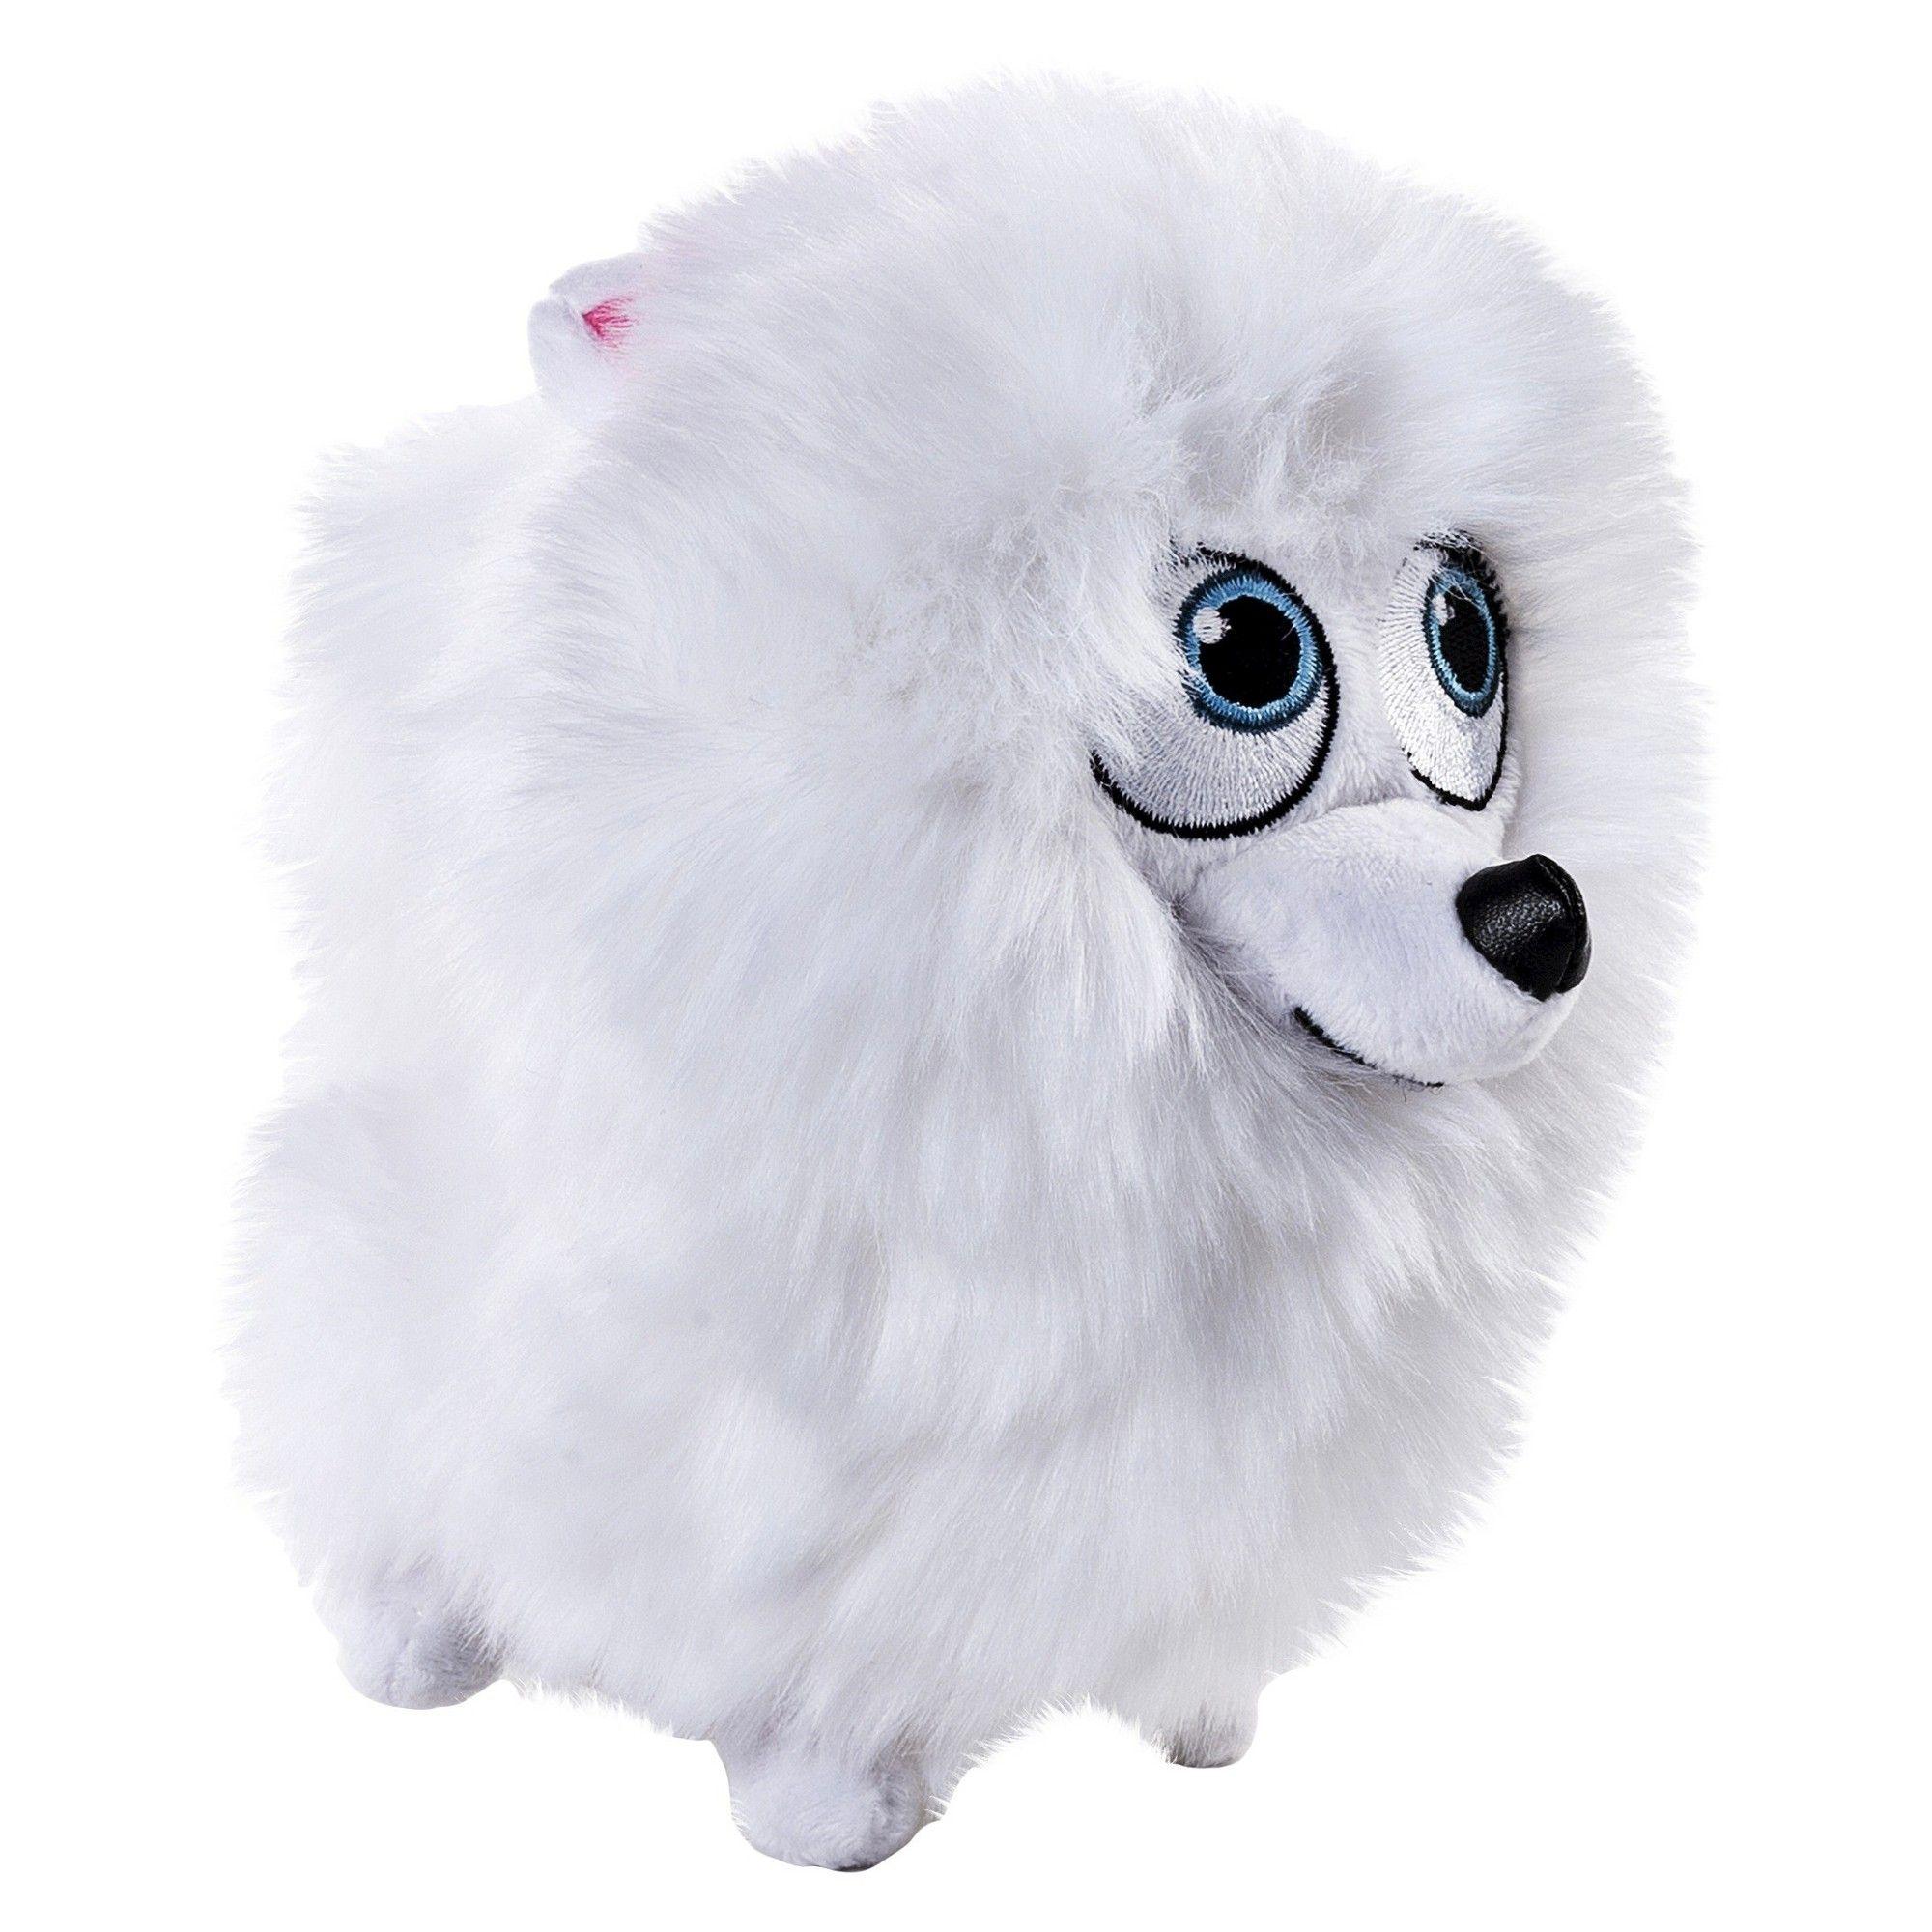 The Secret Life Of Pets 6 Gidget Plush Buddy Secret Life Of Pets Cute Stuffed Animals Pets